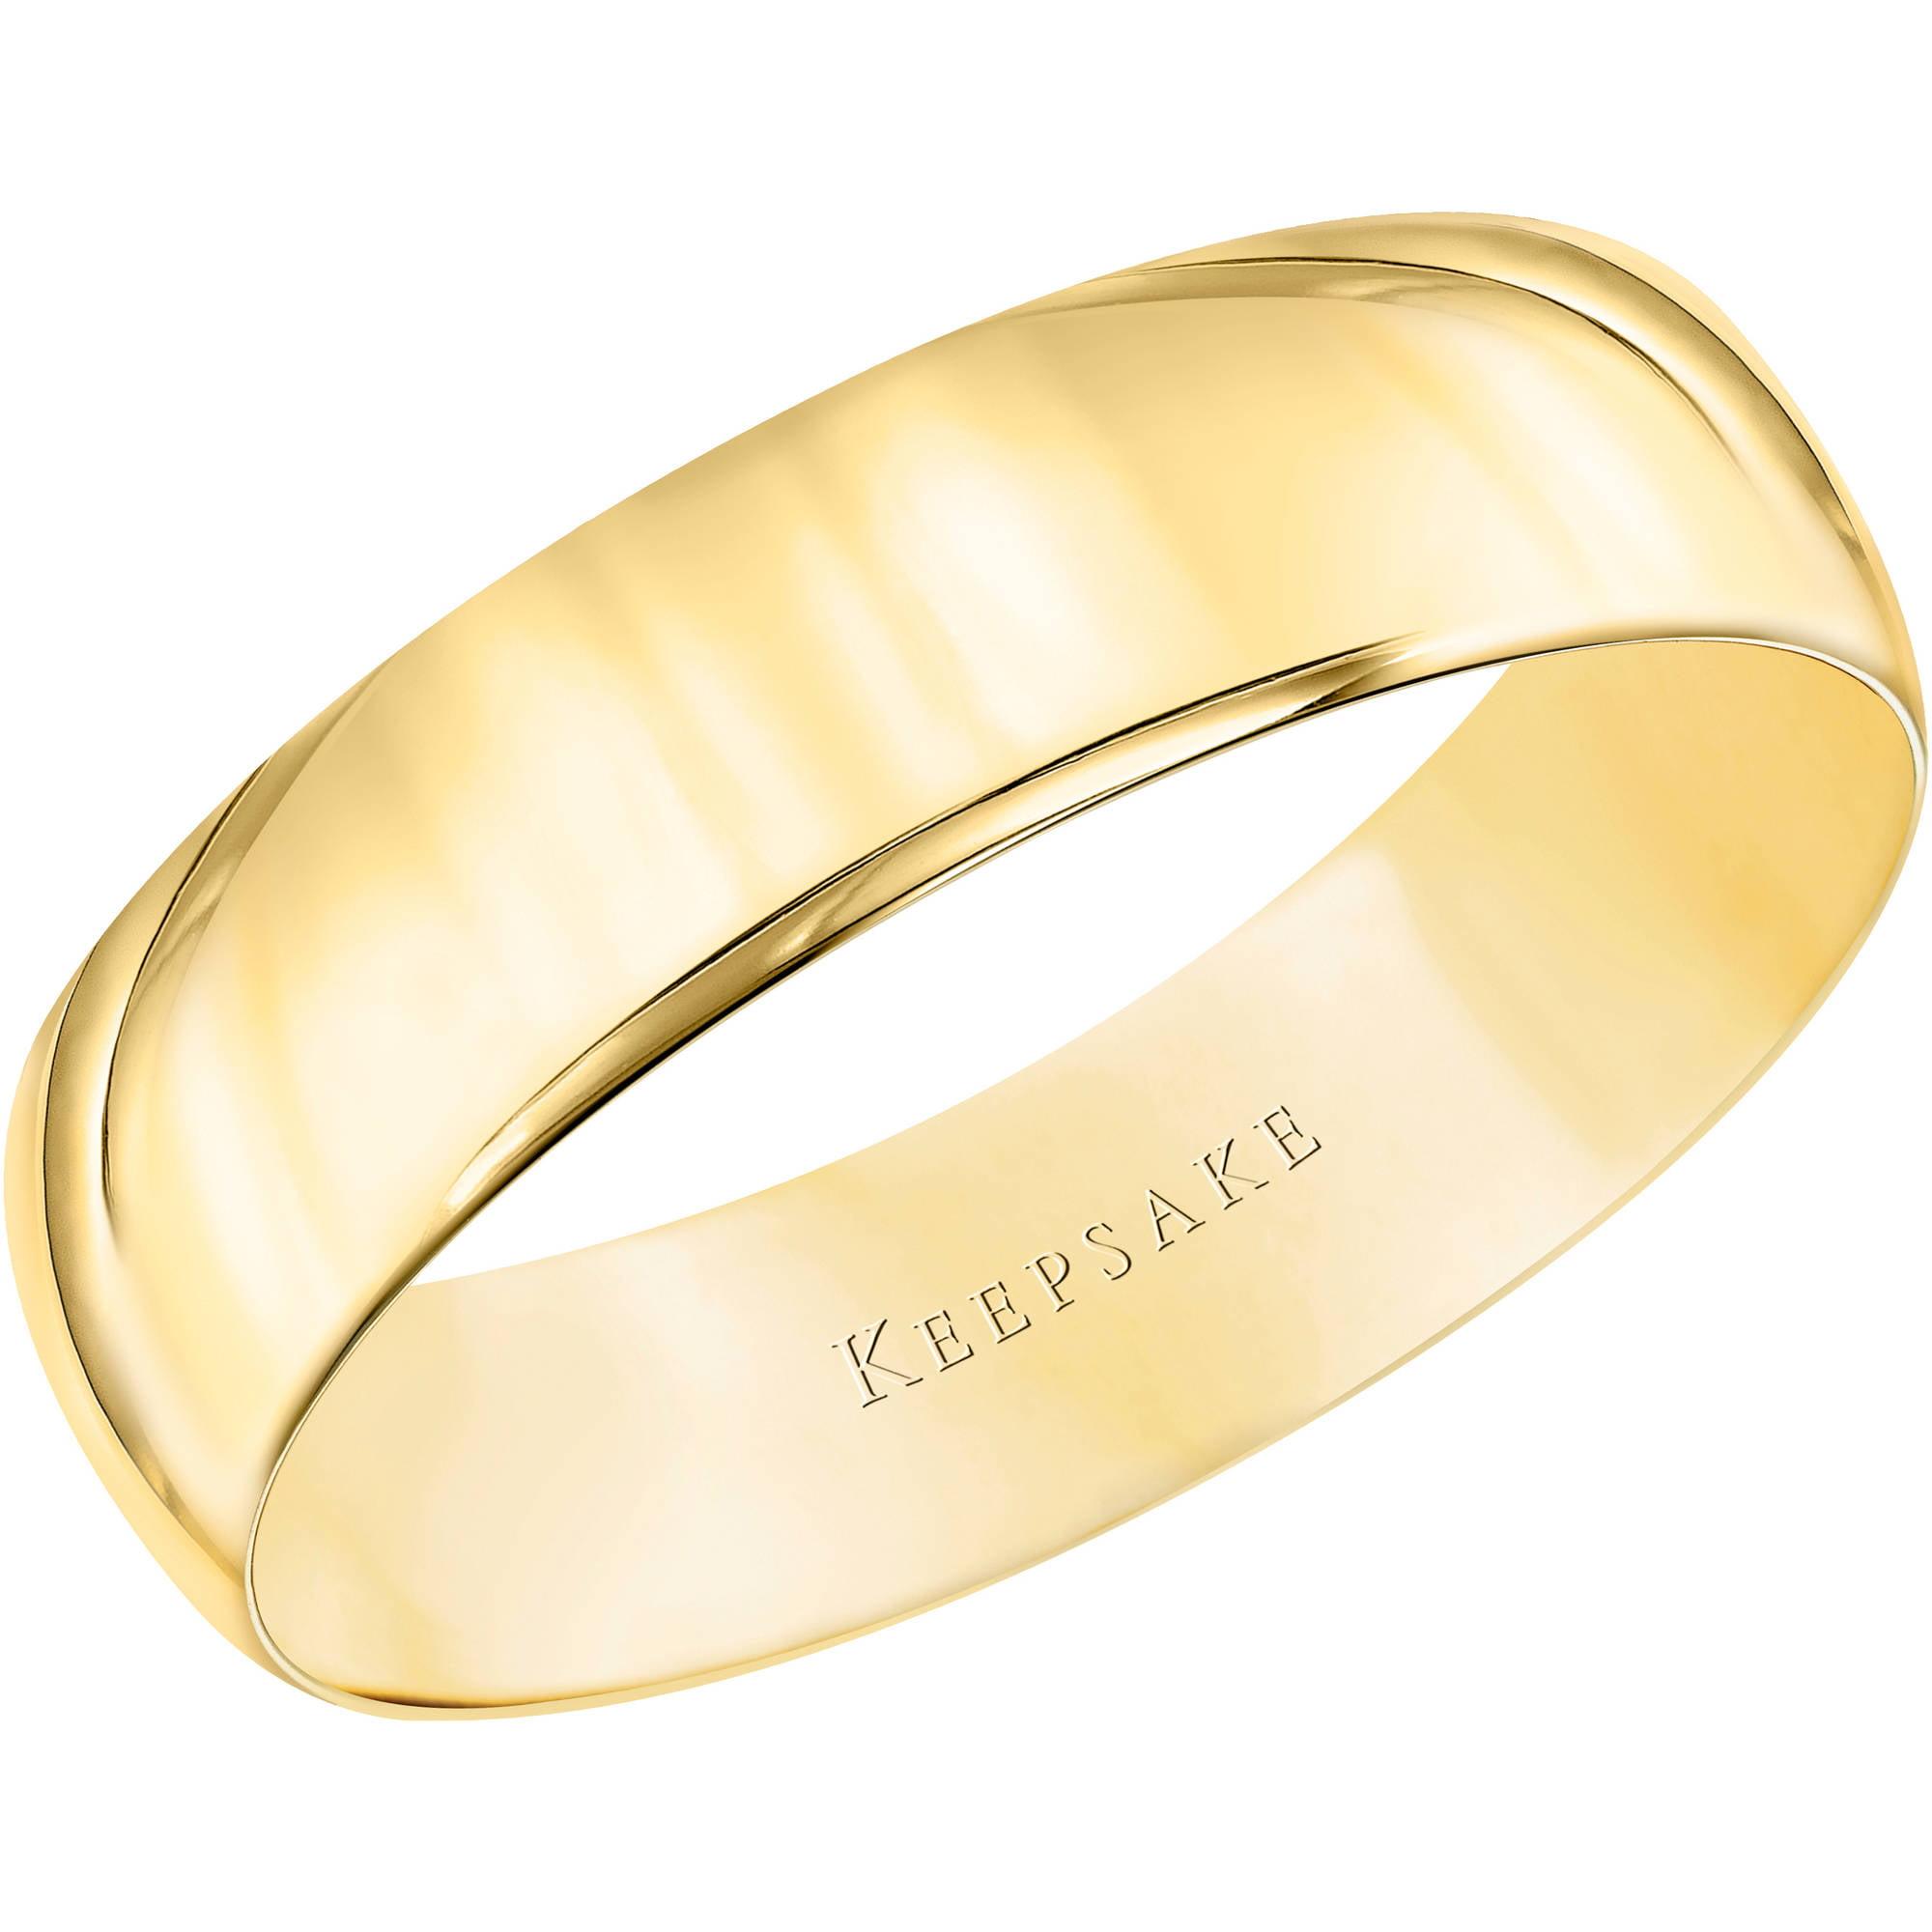 Keepsake 10kt Yellow Gold Comfort Fit Wedding Band, 5.5mm